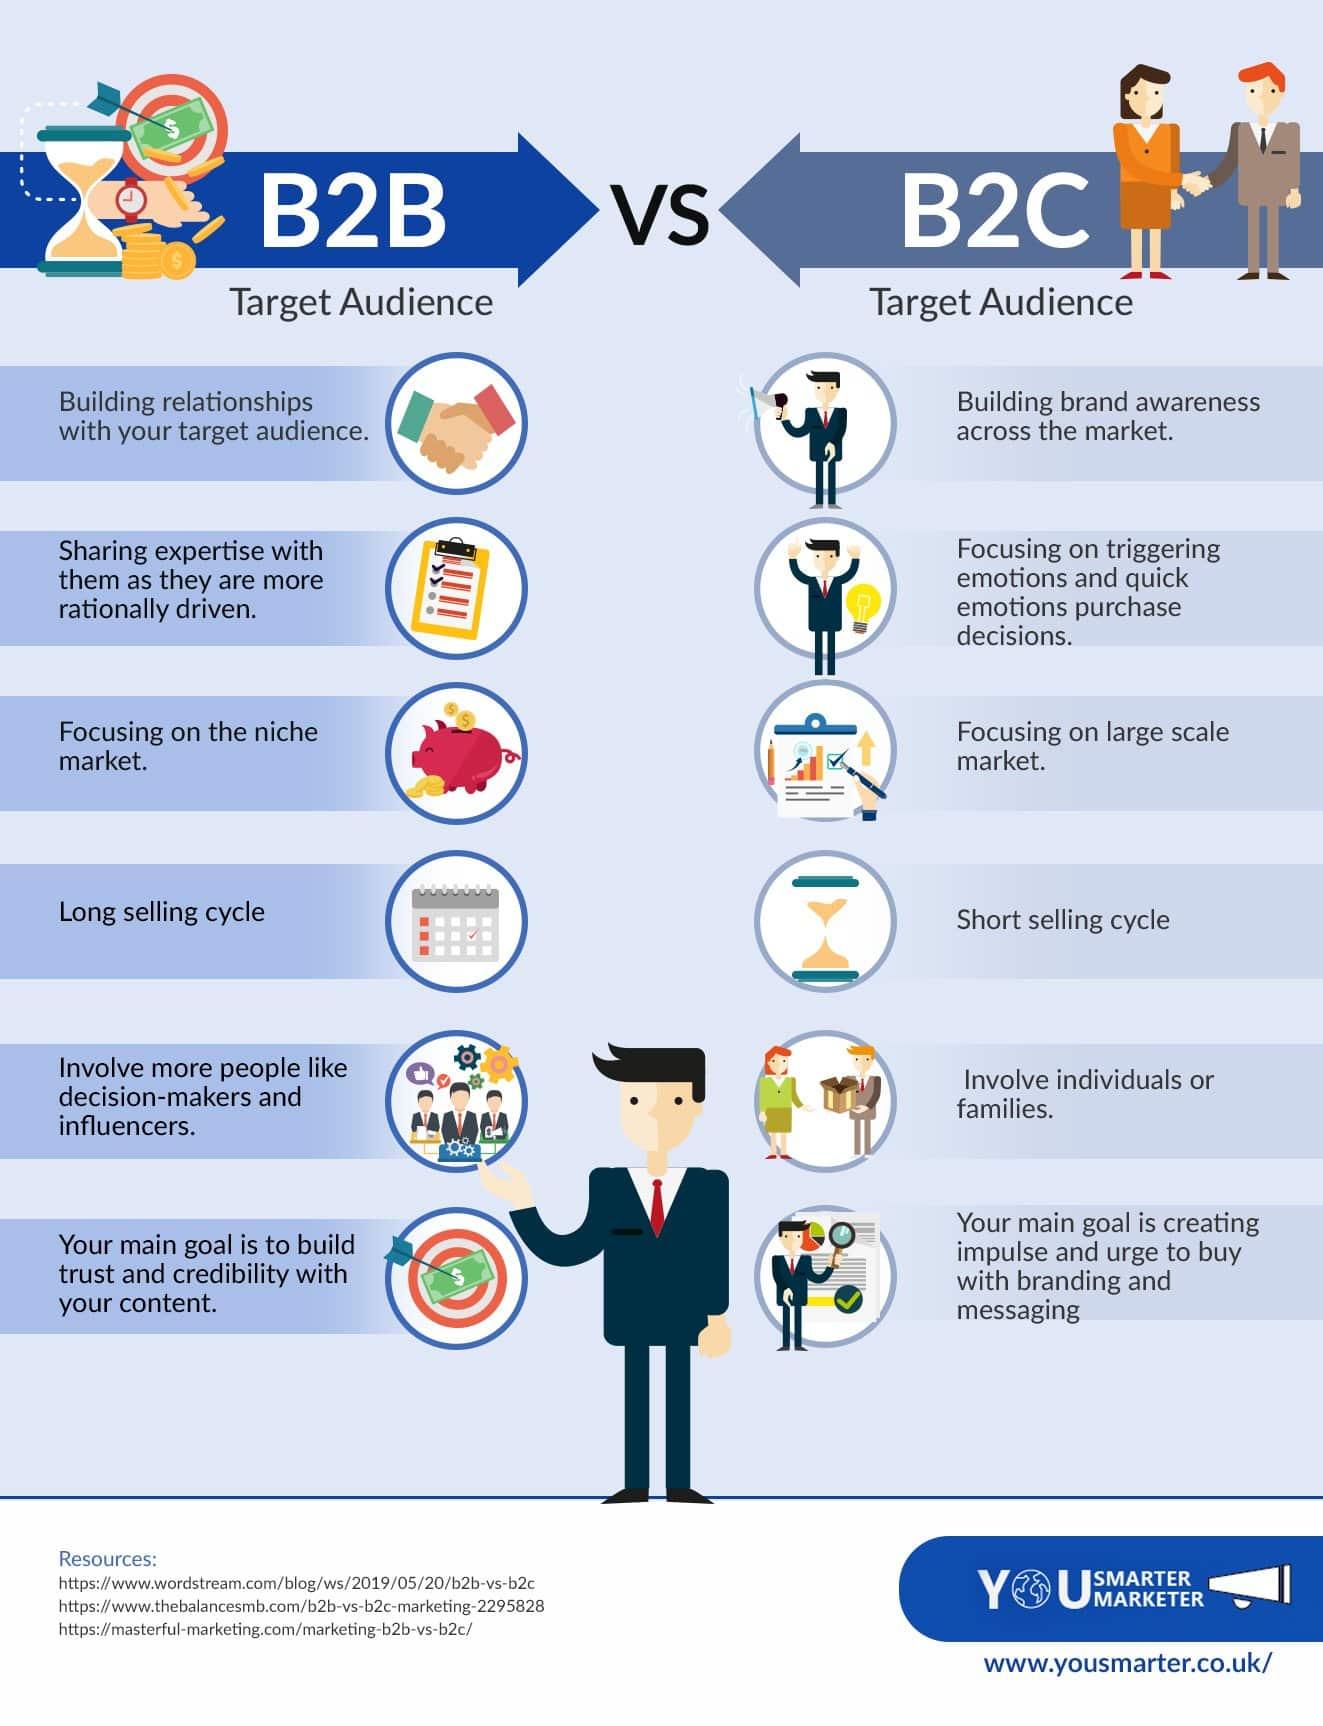 B2C vs B2B Target Audience infographic